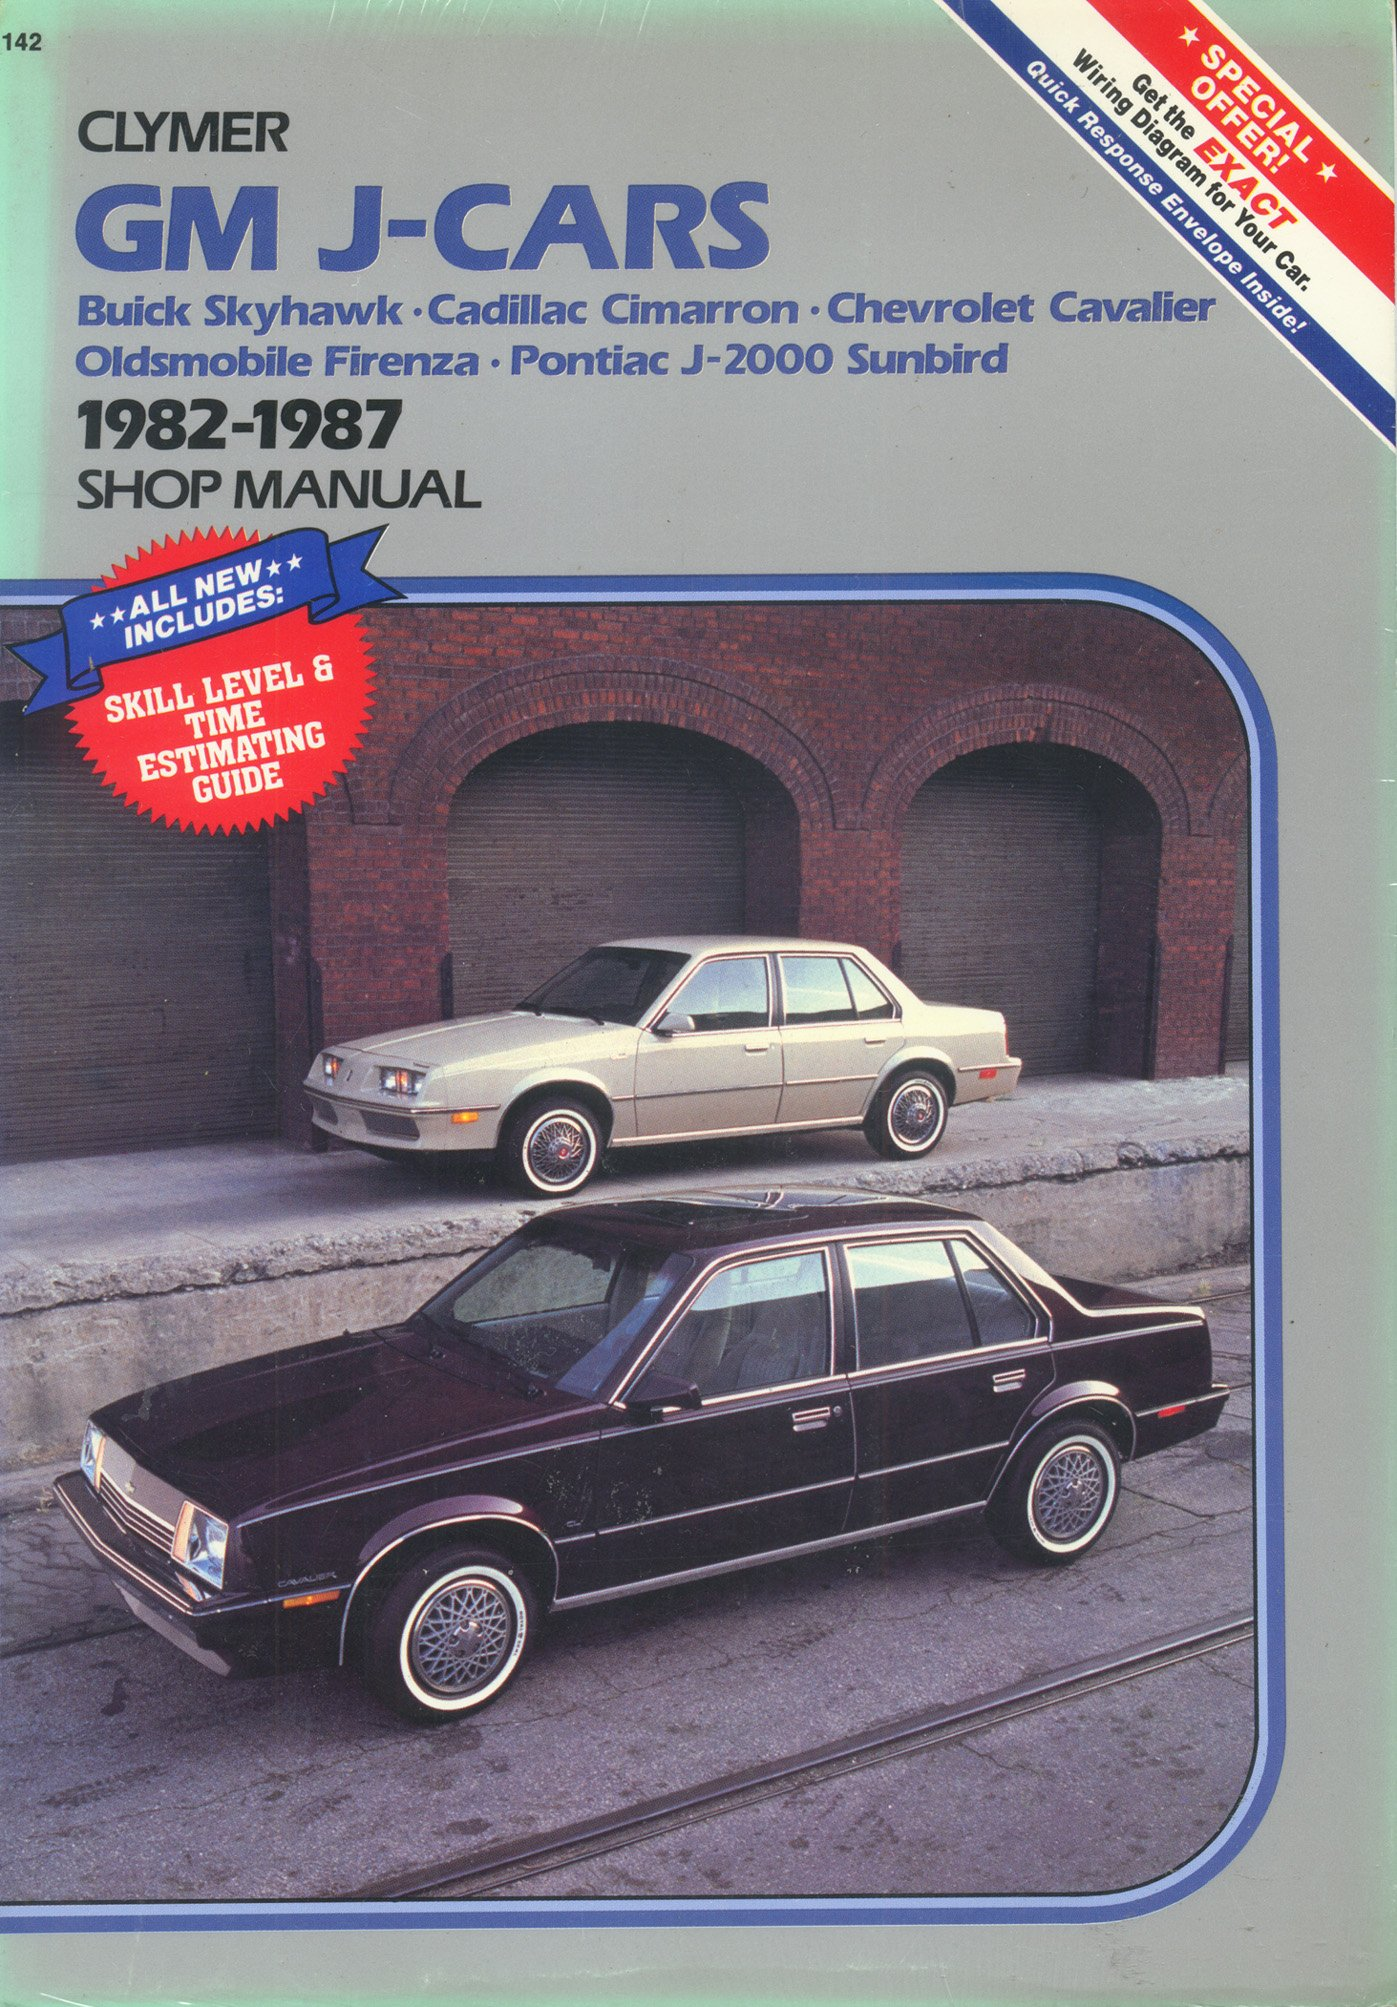 gm j cars buick skyhawk cadillac cimarron chevrolet cavalier rh amazon com 1992 Cadillac 1977 Cadillac